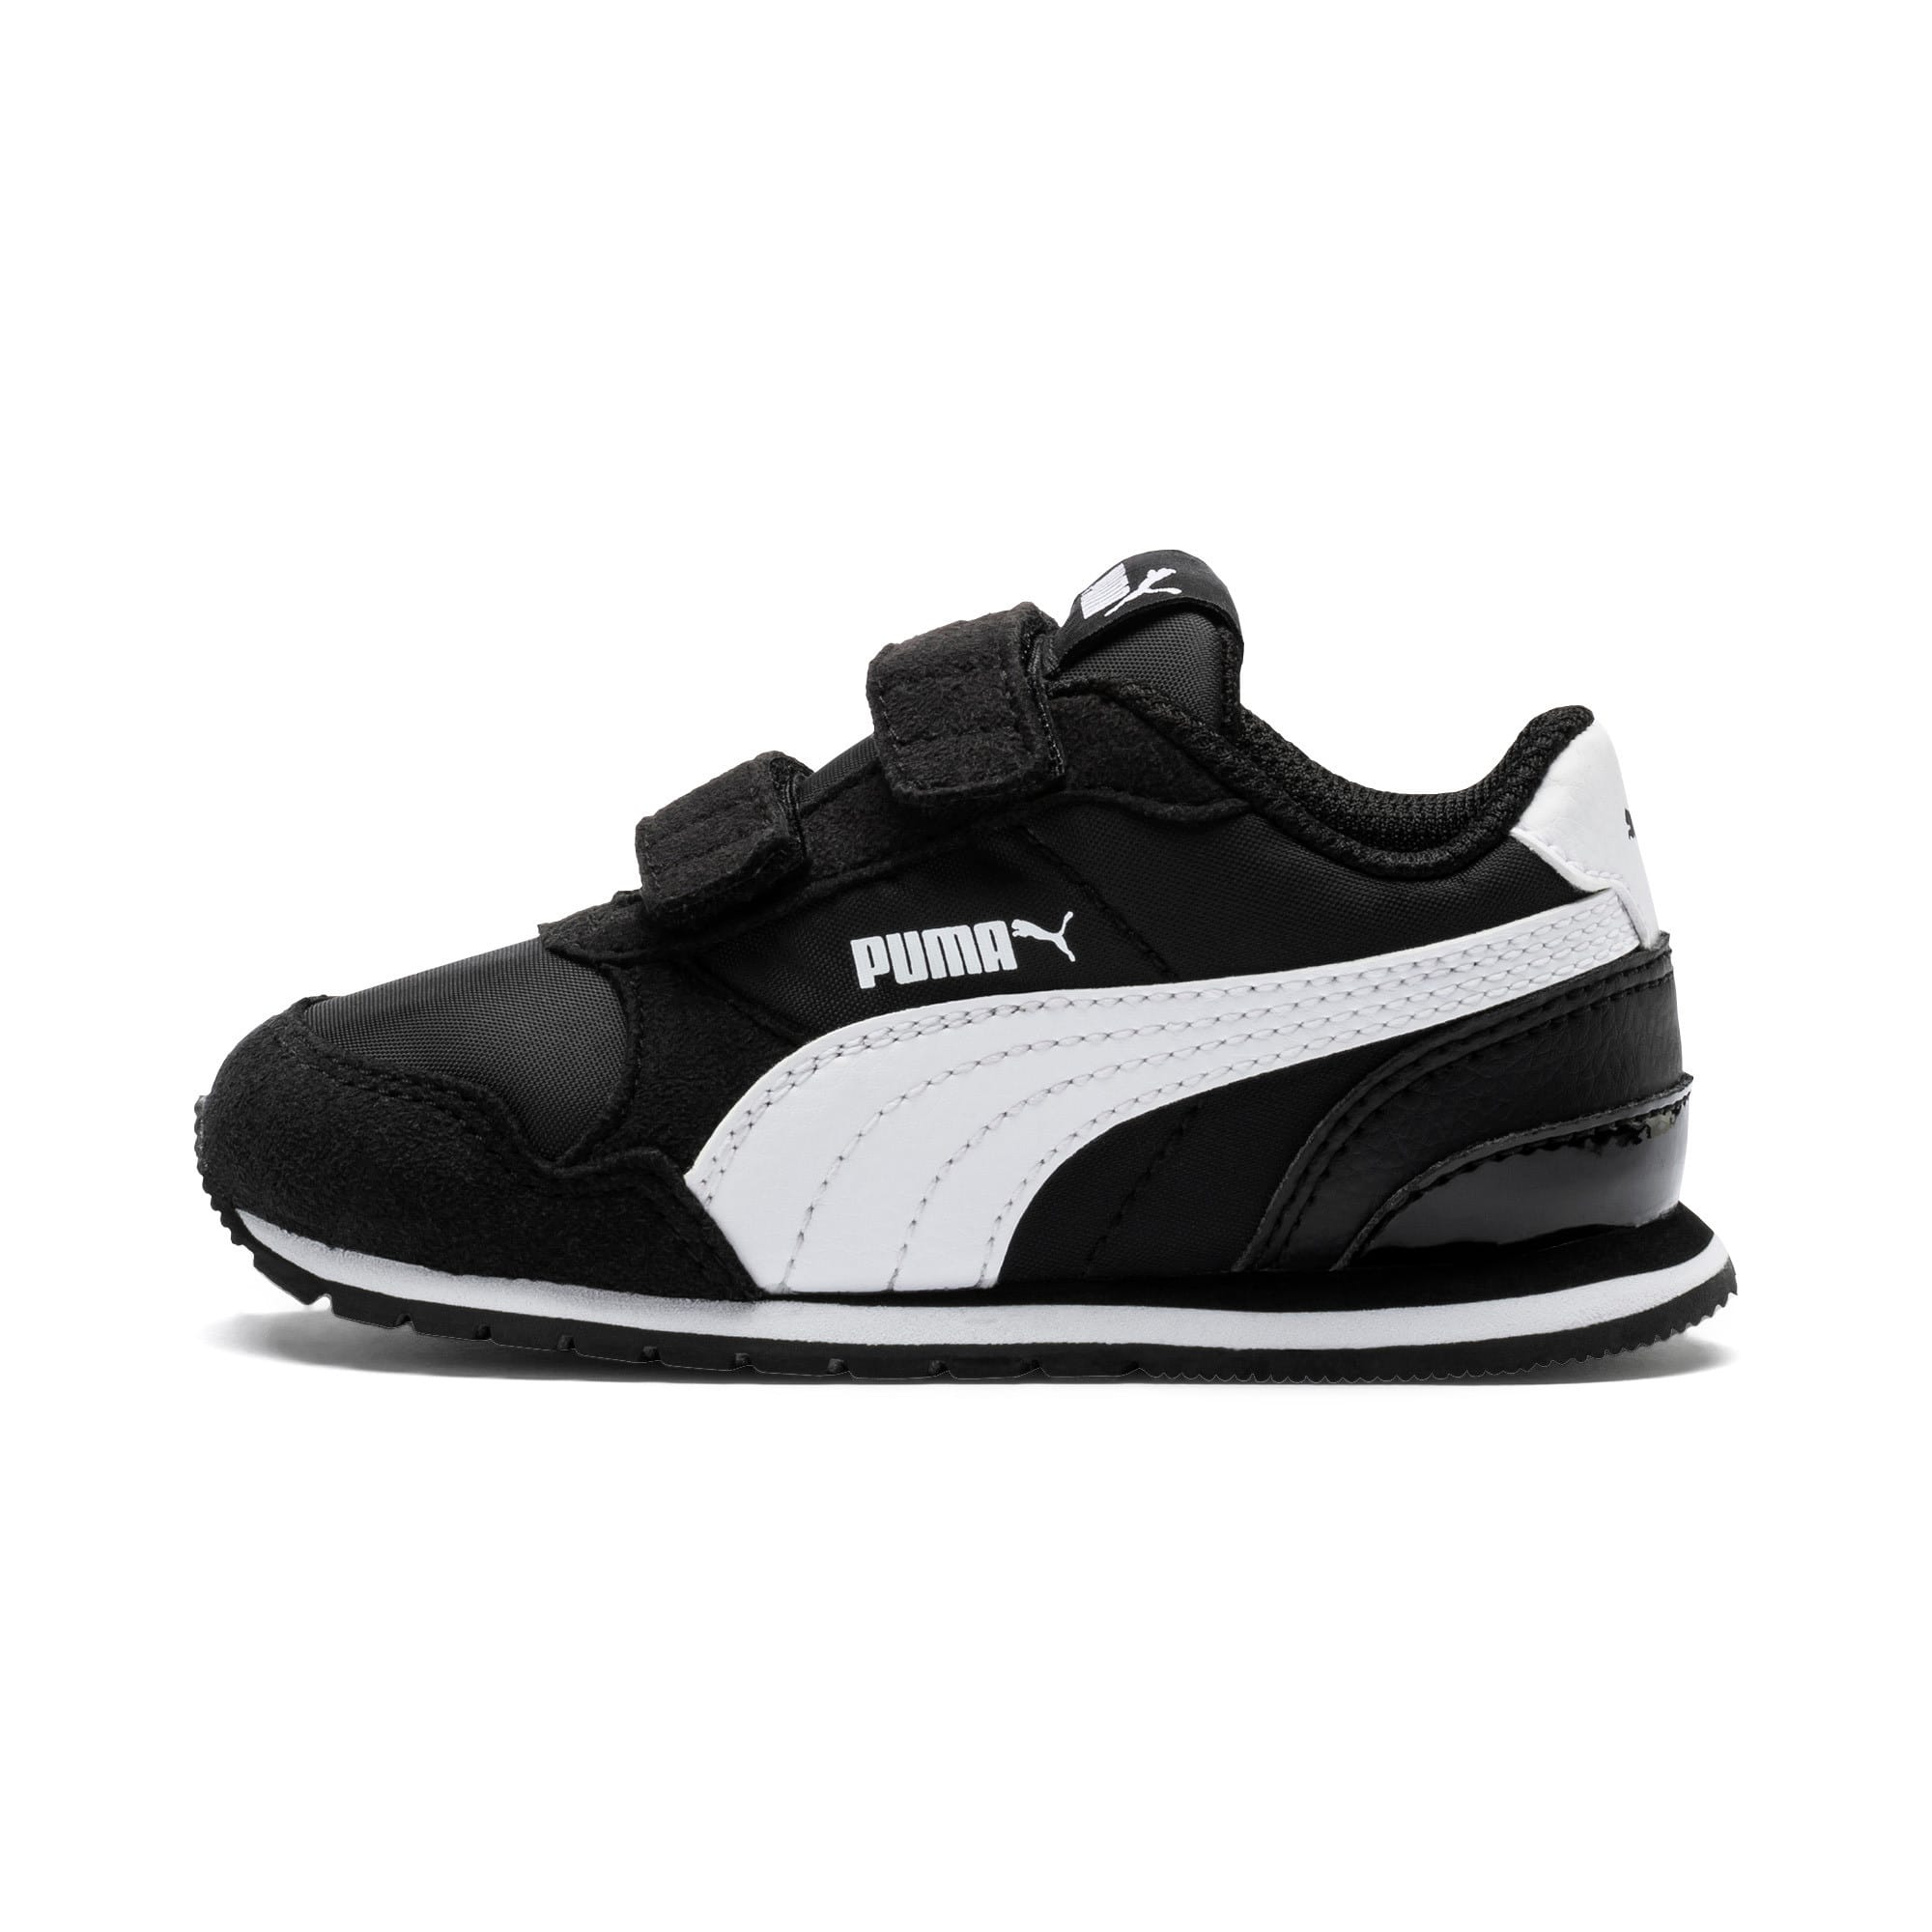 Thumbnail 1 of ST Runner V2 V Toddler Shoes, Puma Black-Puma White, medium